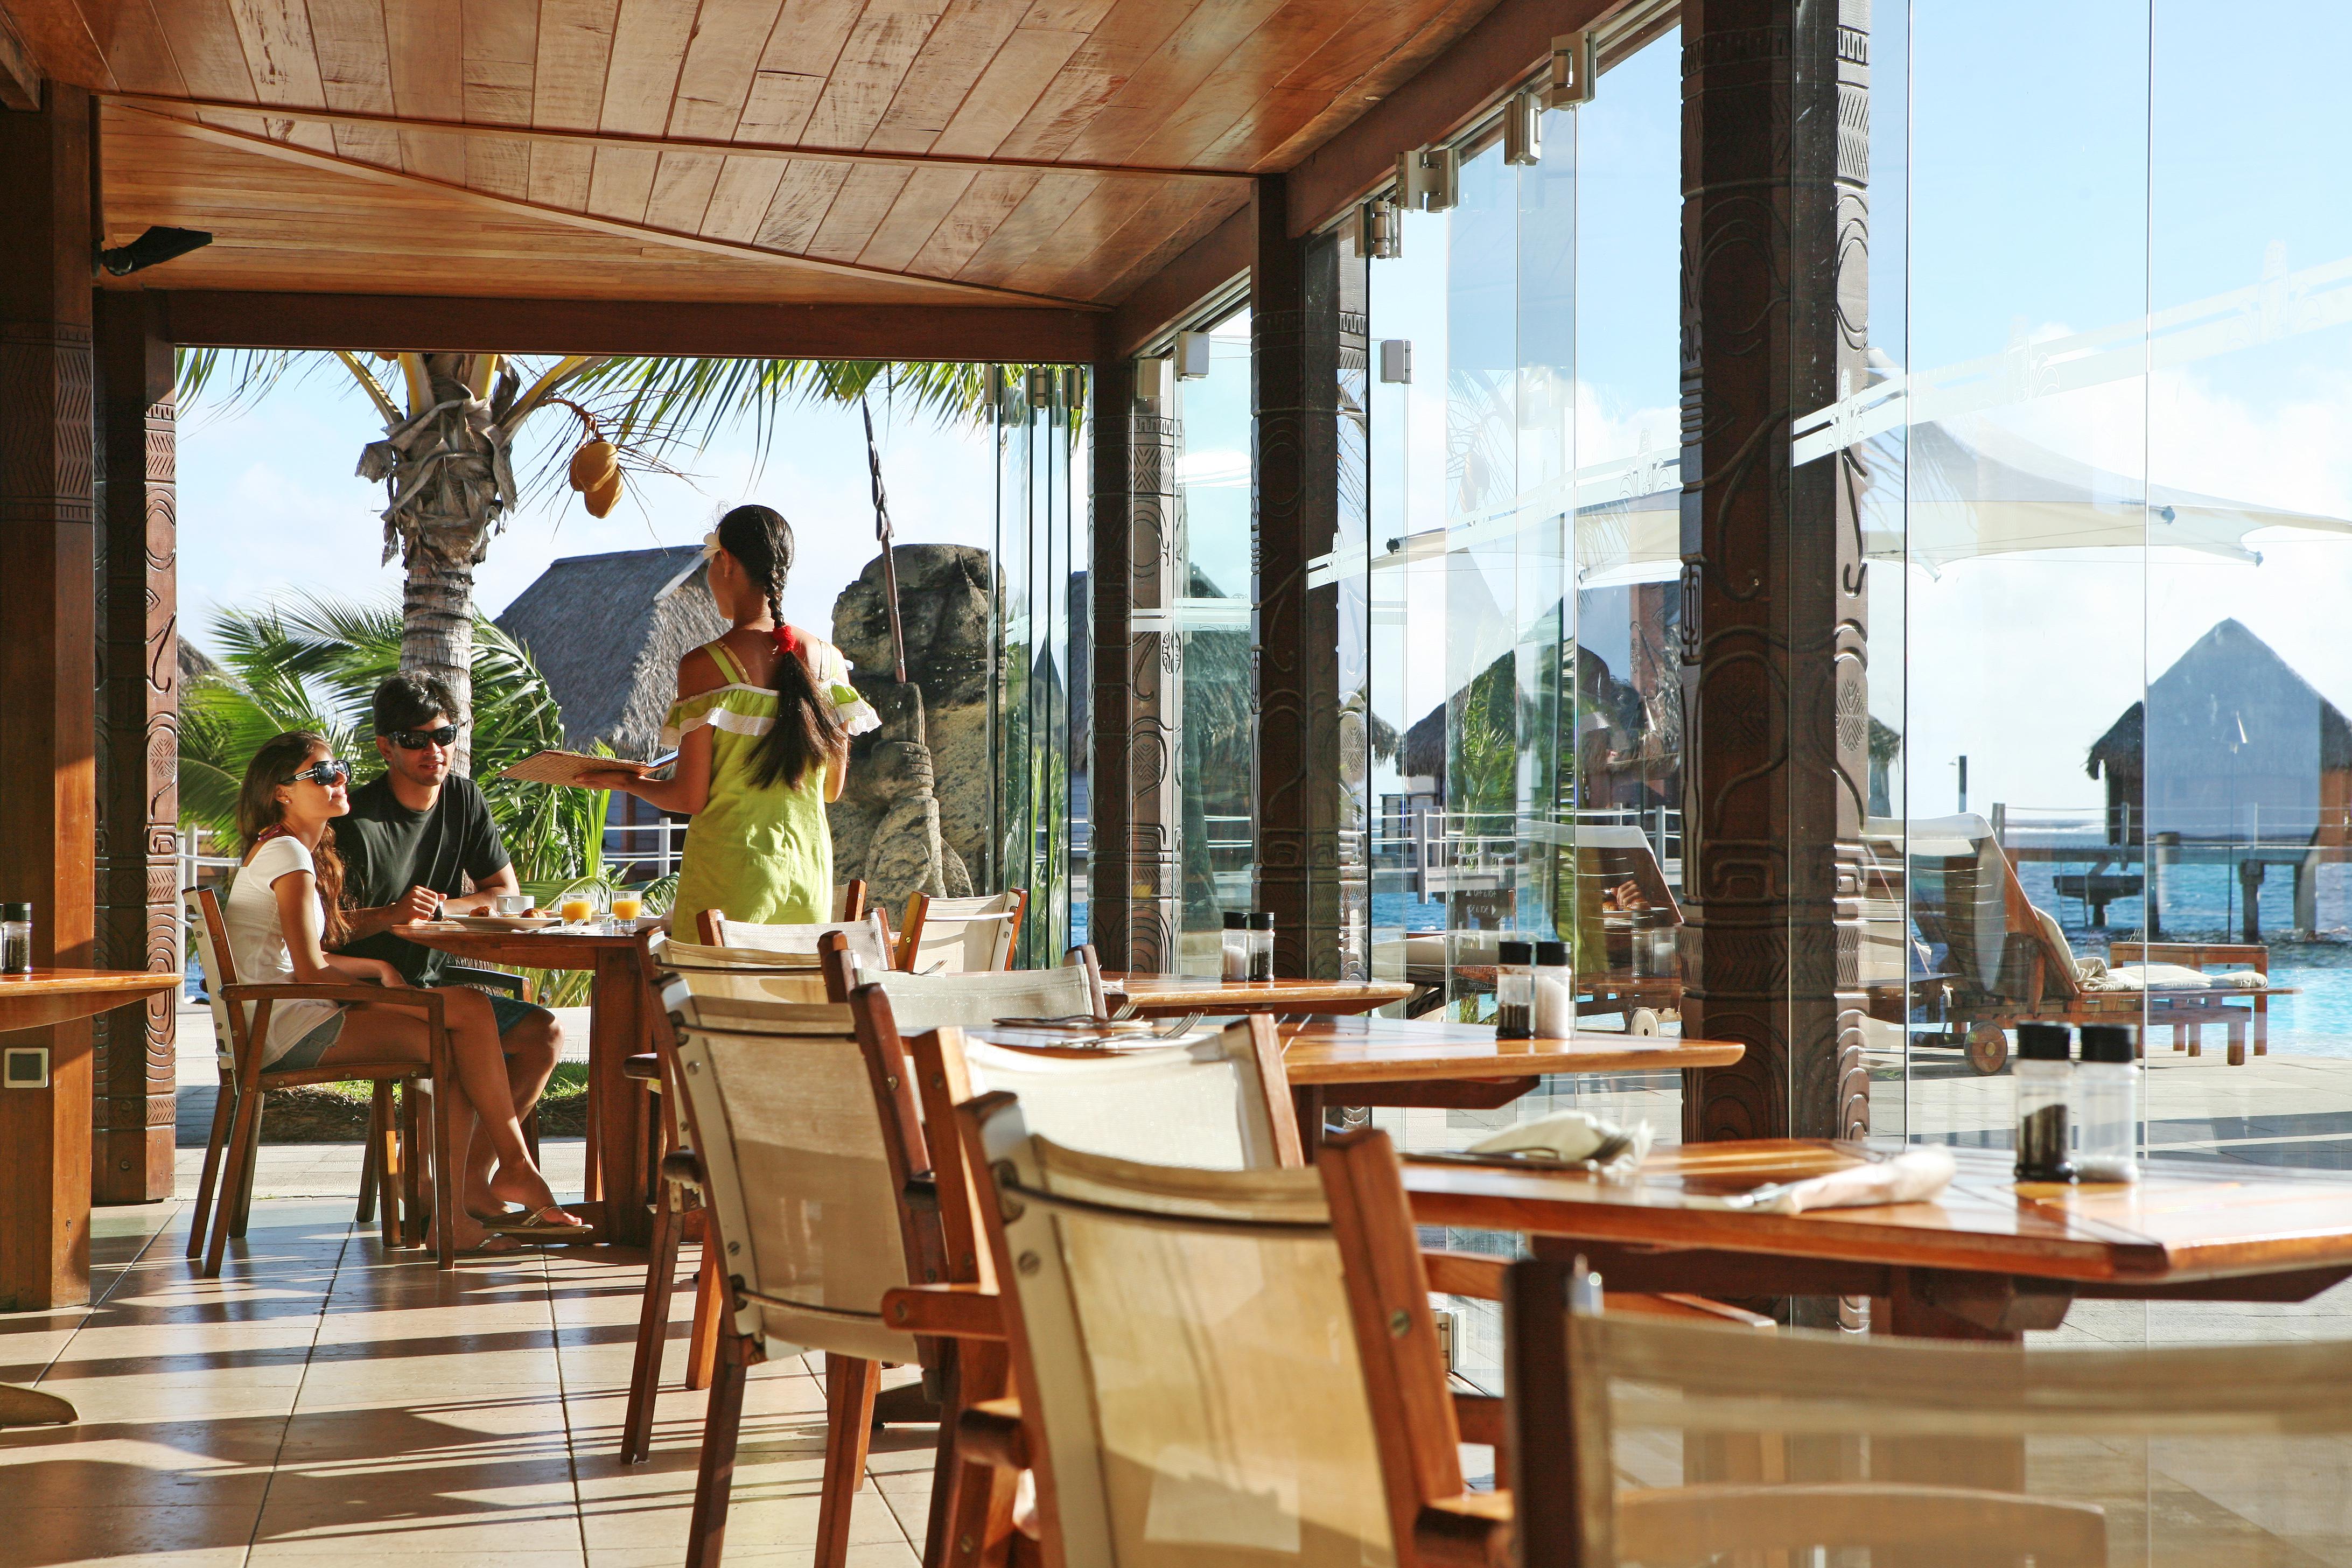 https://tahititourisme.com.au/wp-content/uploads/2018/03/RESTAURATION-Restaurant-Mahanai-3-Greg_LeBacon.jpg